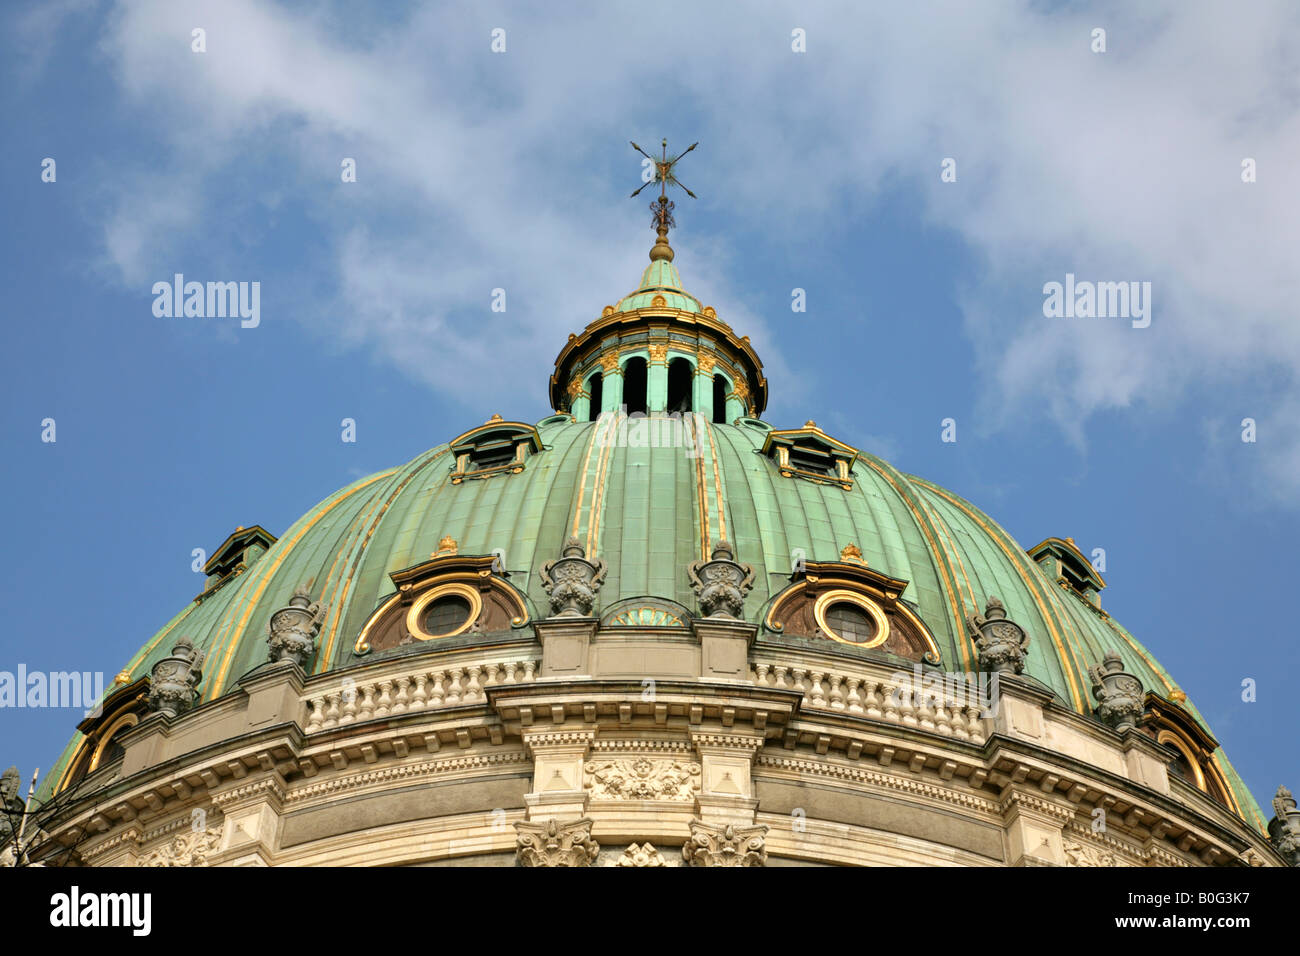 The dome of Frederikskirken, or Marmorkirken, or Marble Church, Copenhagen, Denmark - Stock Image